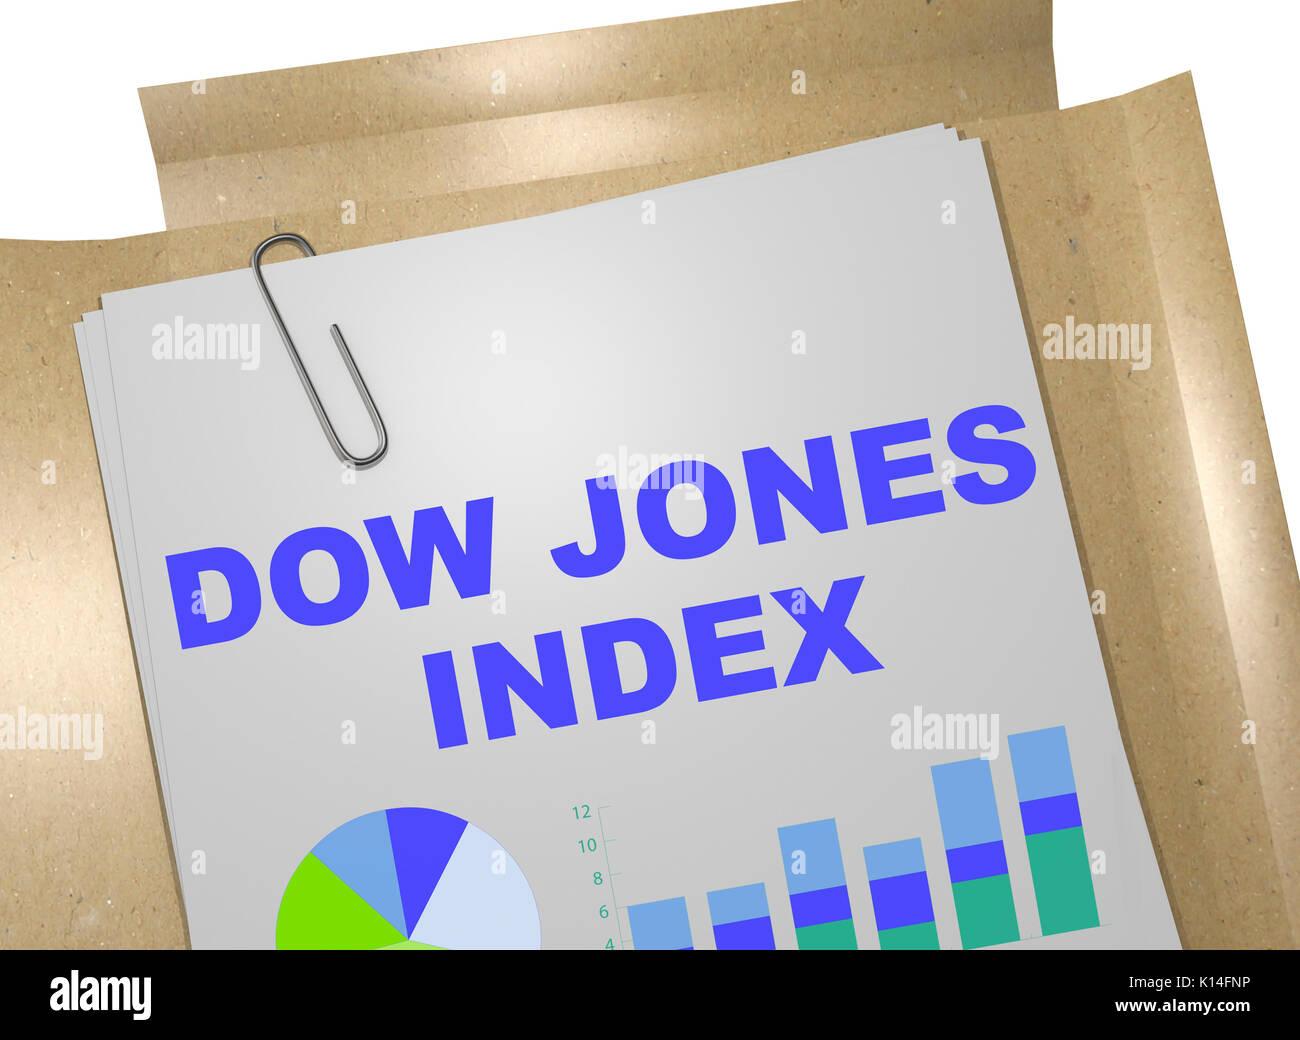 Dow jones stock photos dow jones stock images alamy 3d illustration of dow jones index title on business document stock image buycottarizona Choice Image